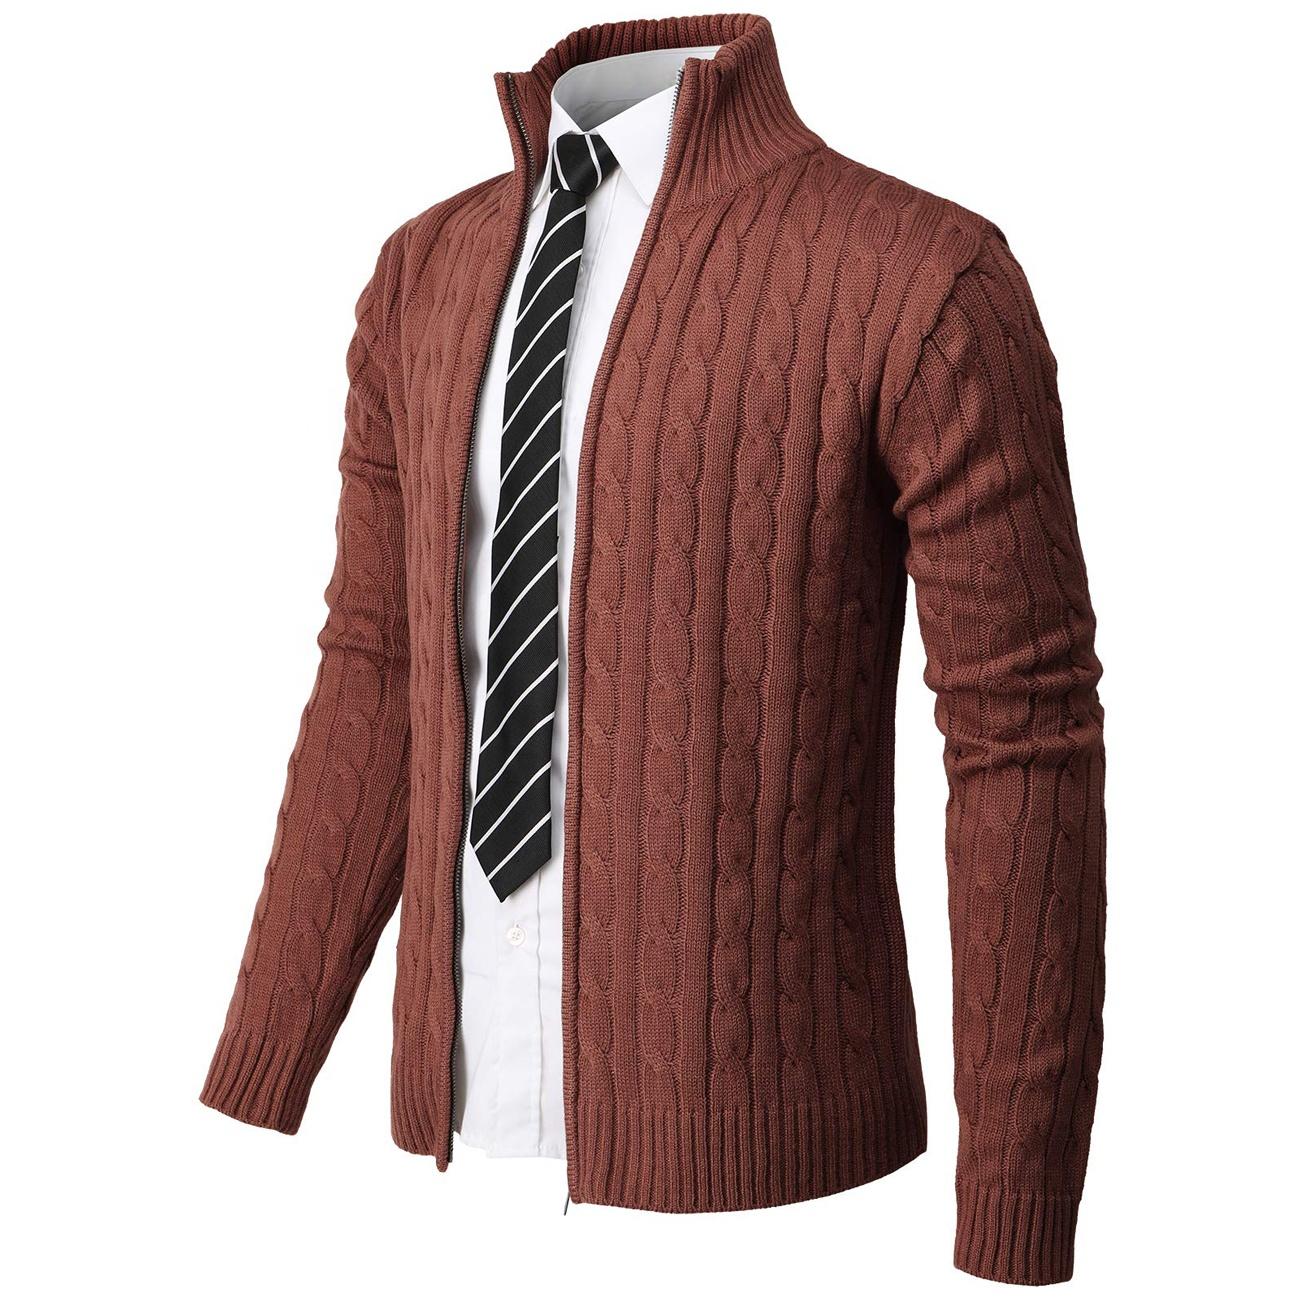 2021 Casual Slim Fit Zip Up Long Sleeve Men Cardigan Turtleneck Sweater